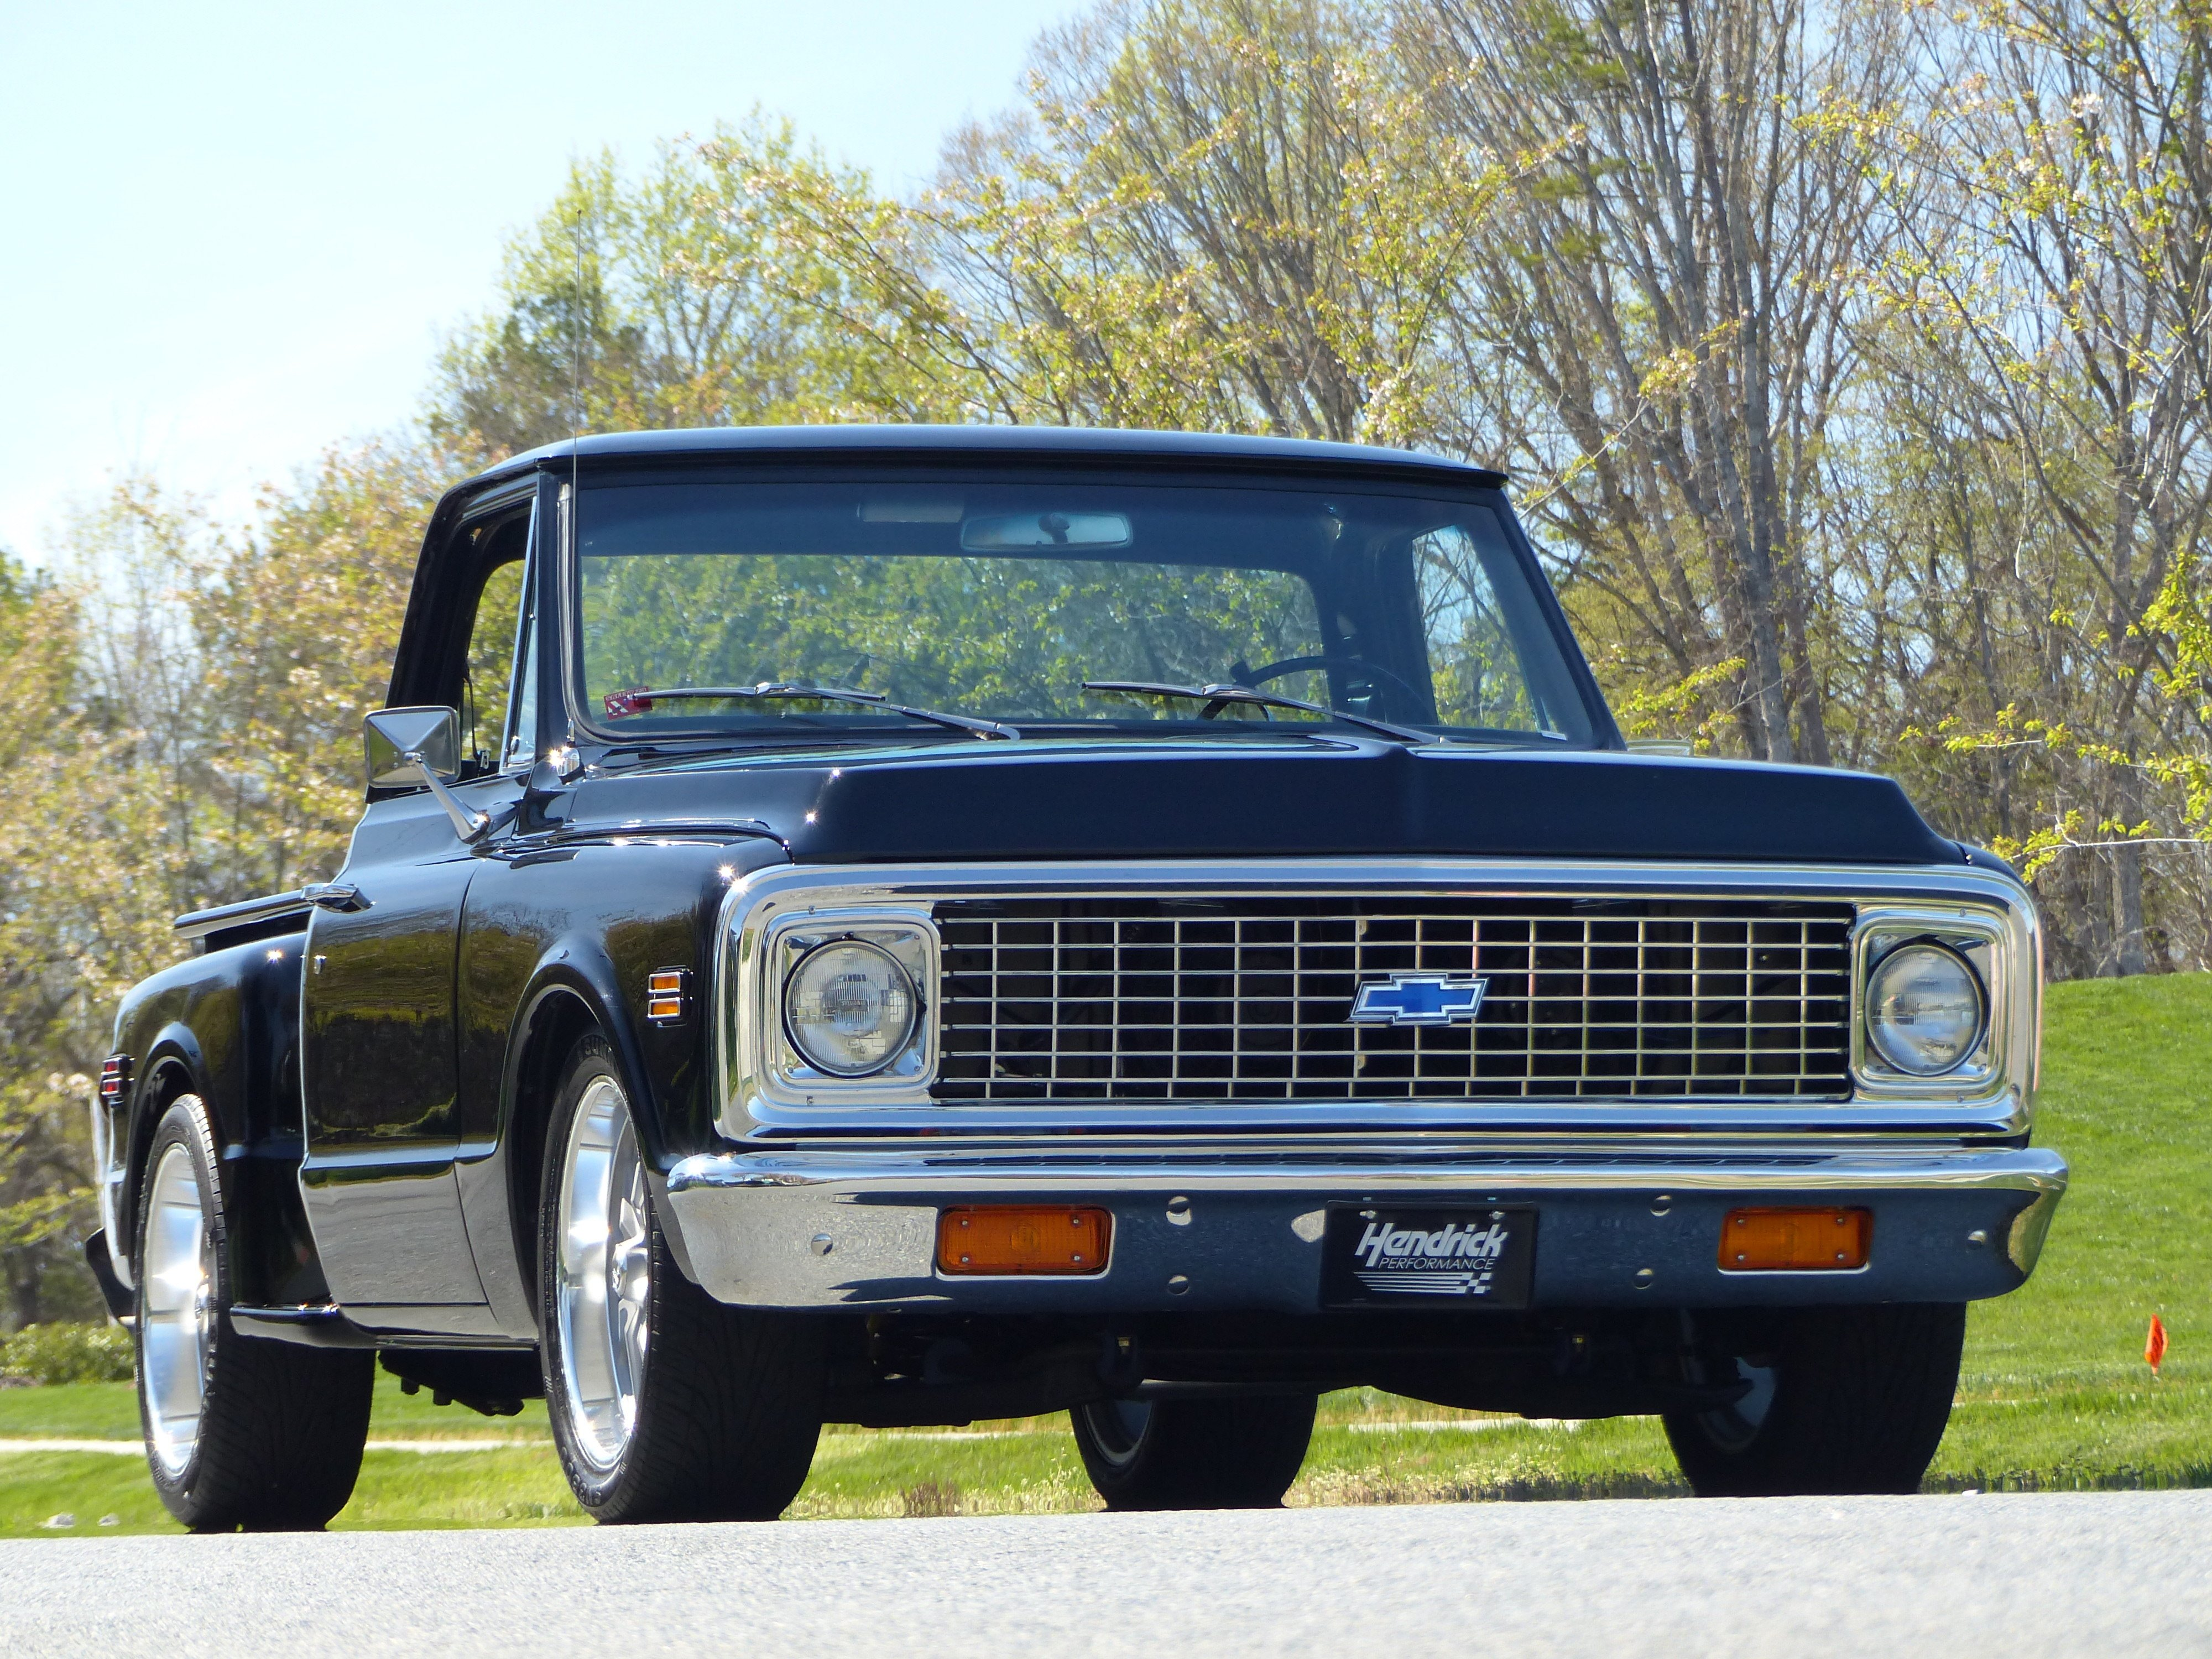 1962 chevrolet c k truck classics for sale classics on autotrader1972 chevrolet c k truck